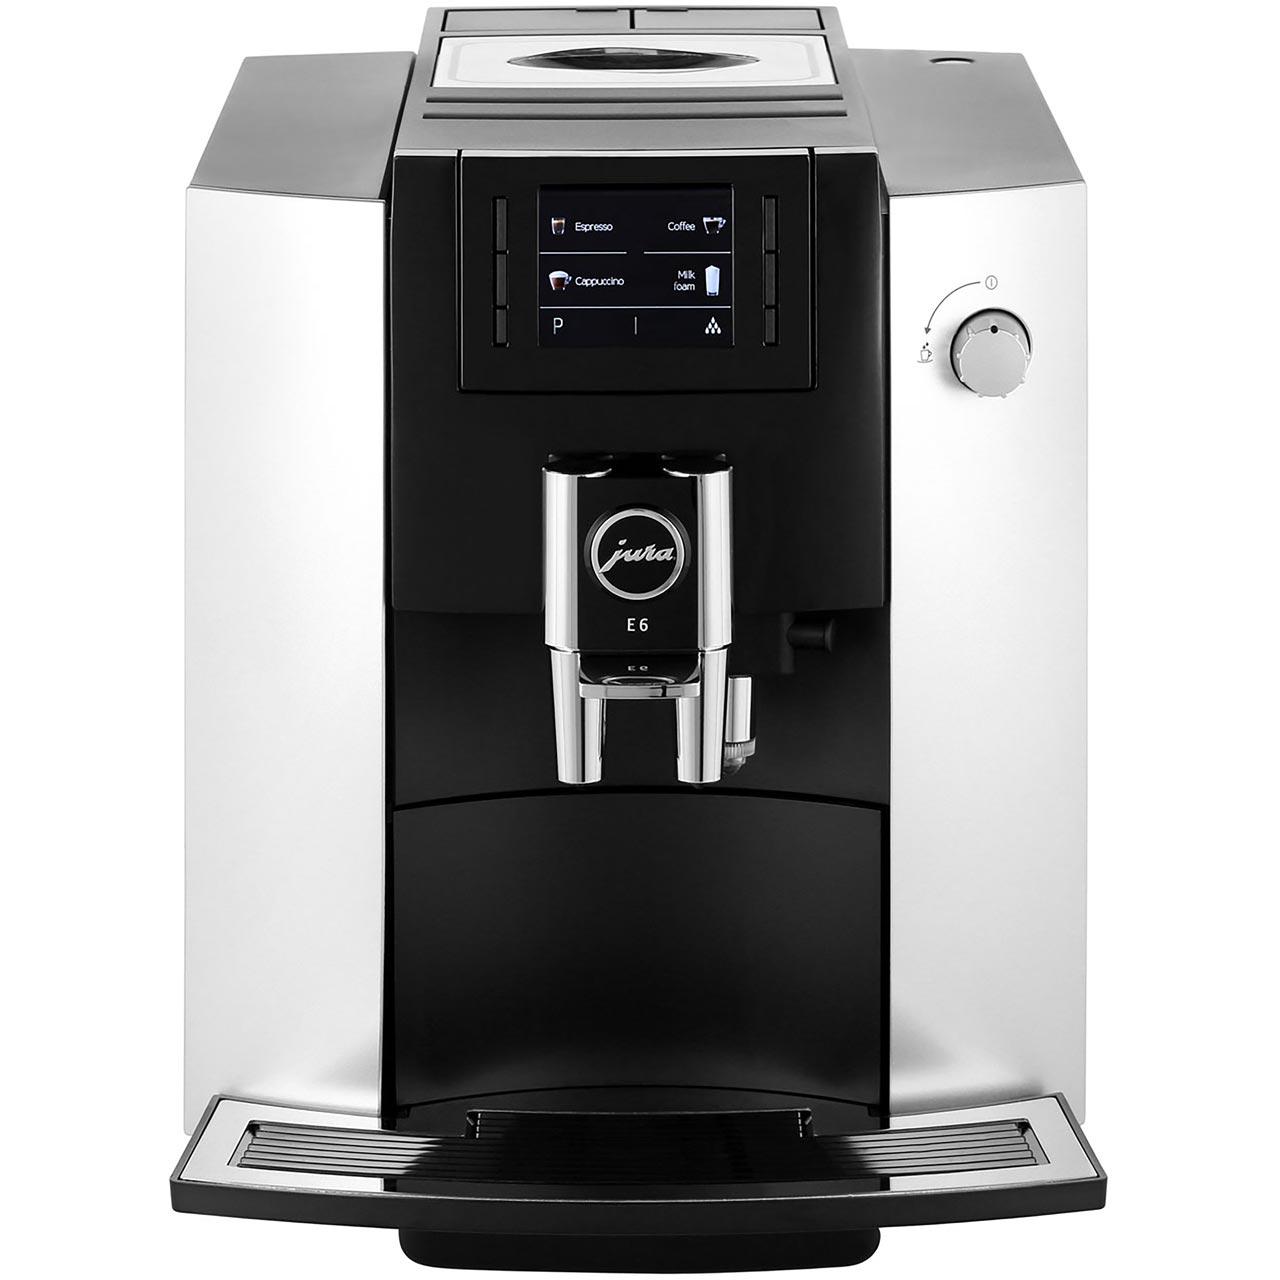 jura e6 bean to cup coffee machine 1450 watt 15 bar. Black Bedroom Furniture Sets. Home Design Ideas